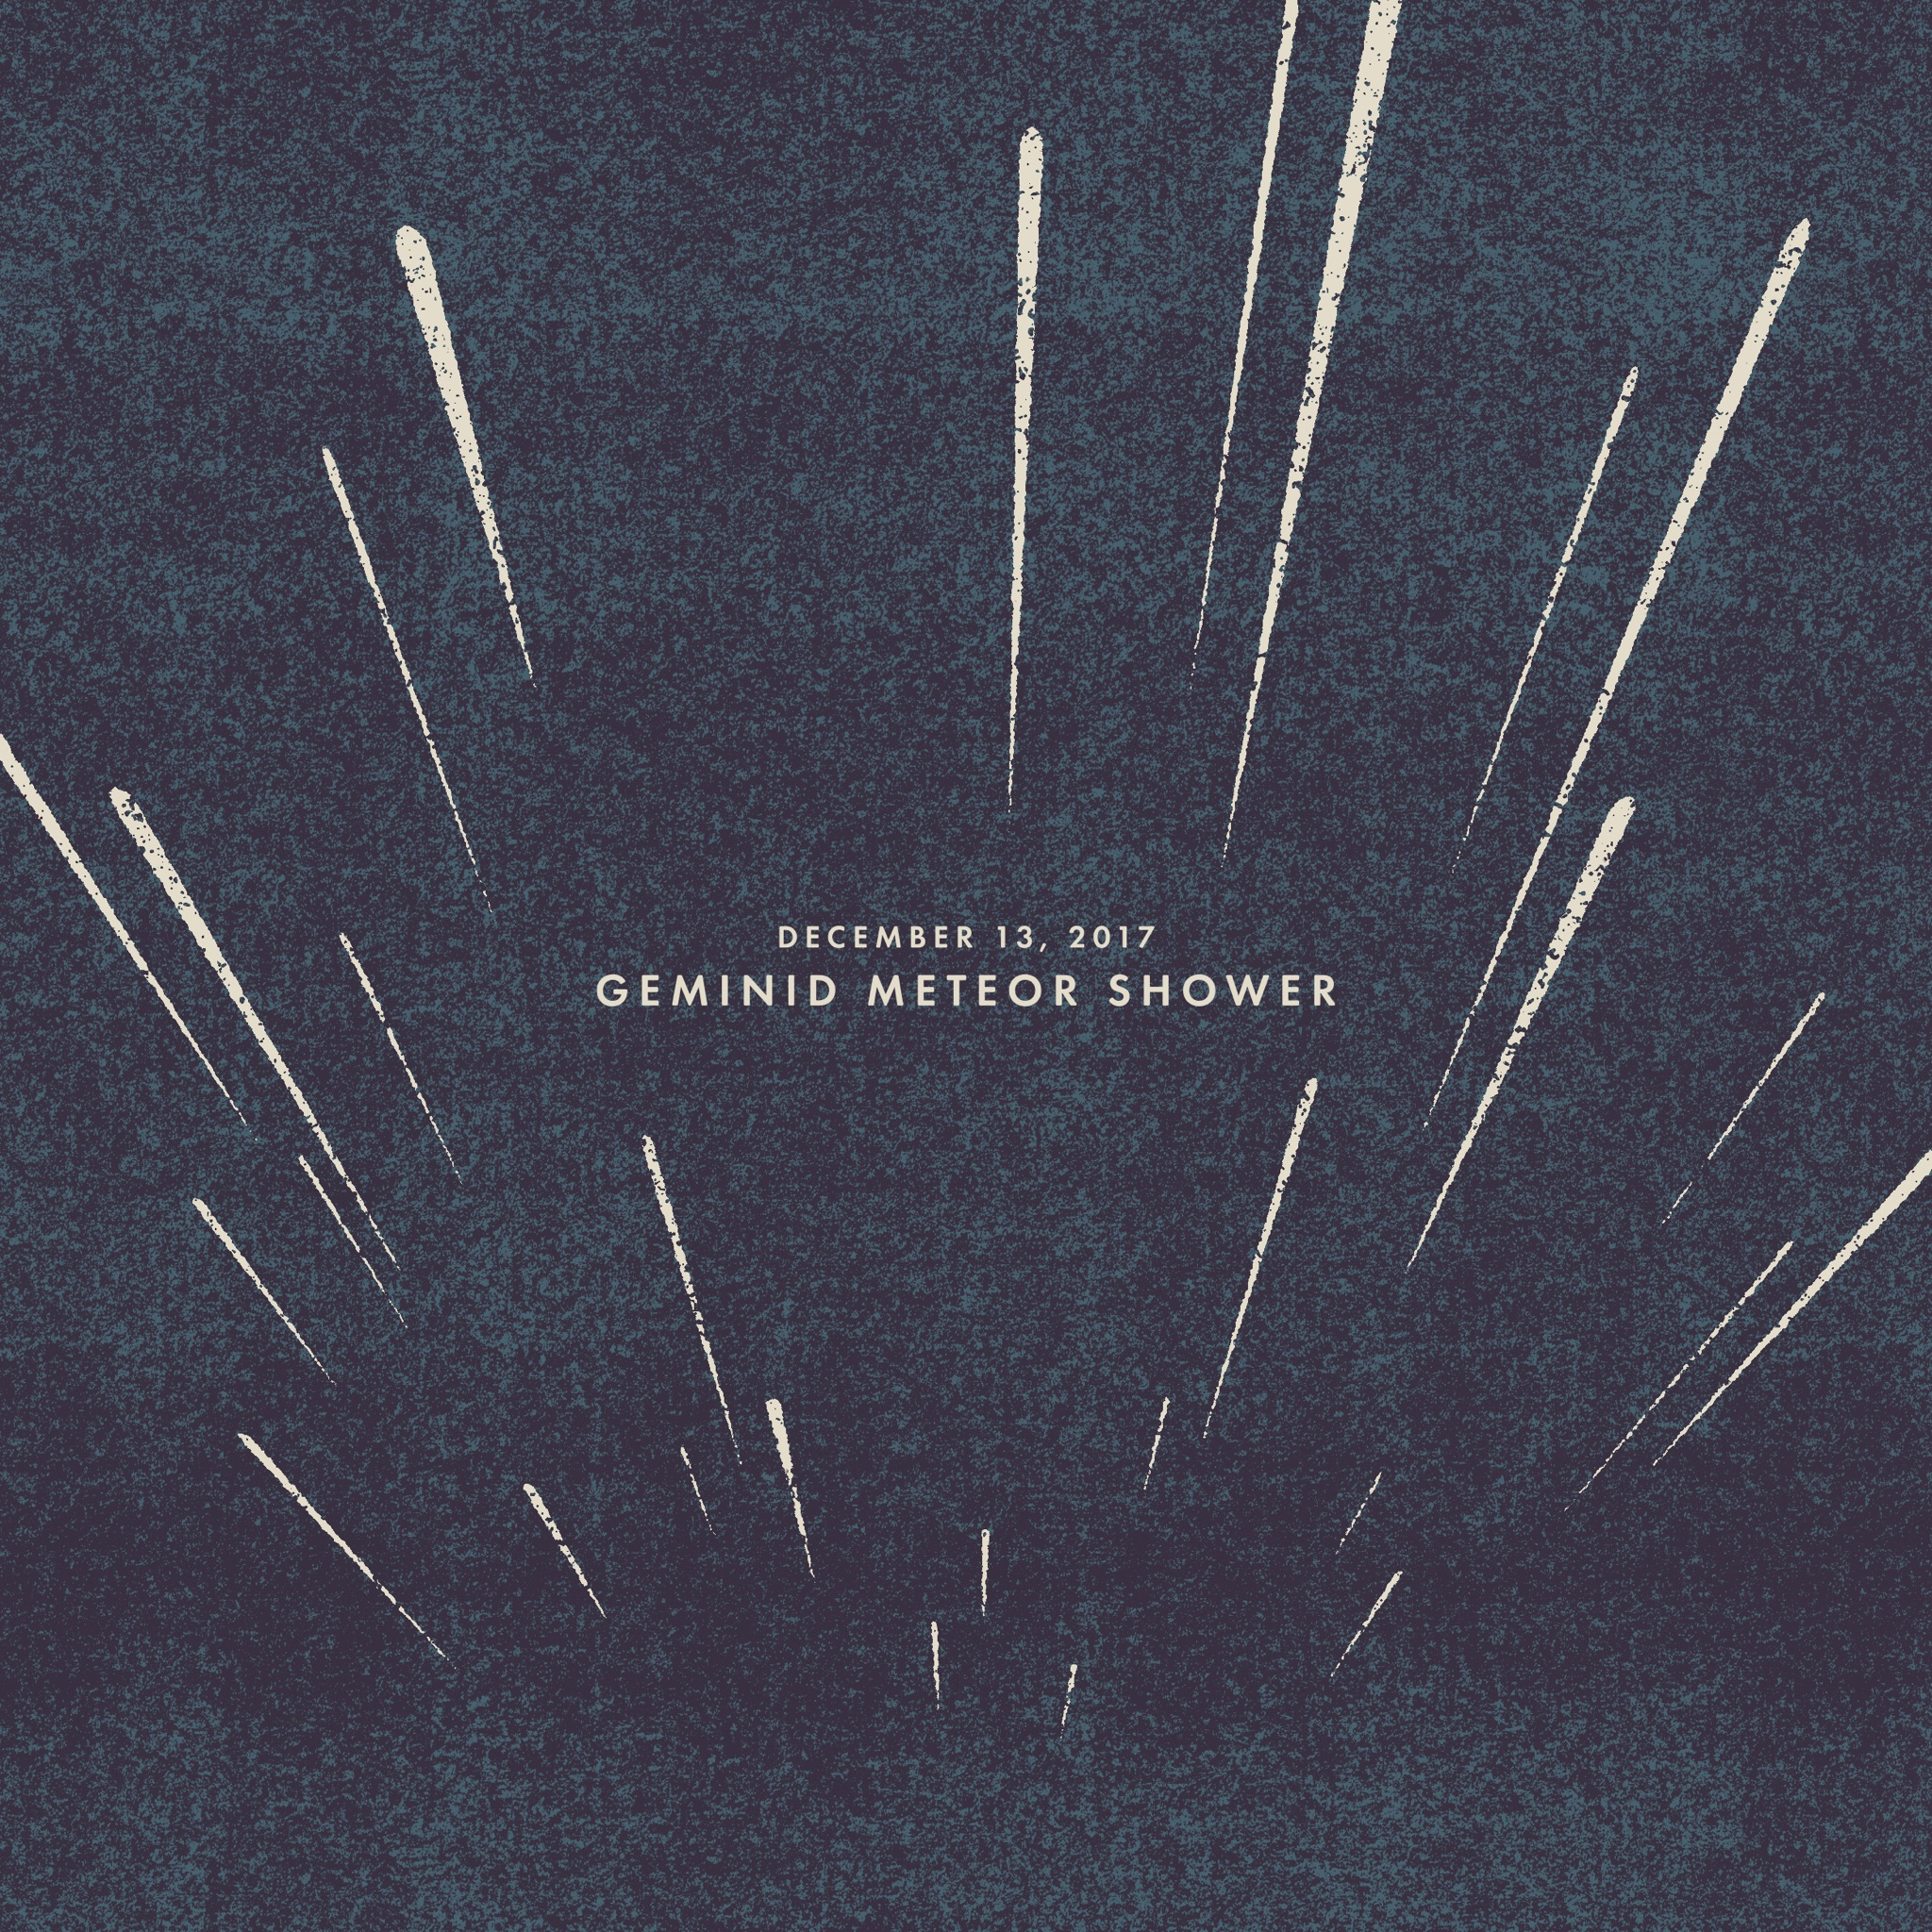 Astronomy-GeminidMeteorShower.jpg.jpeg